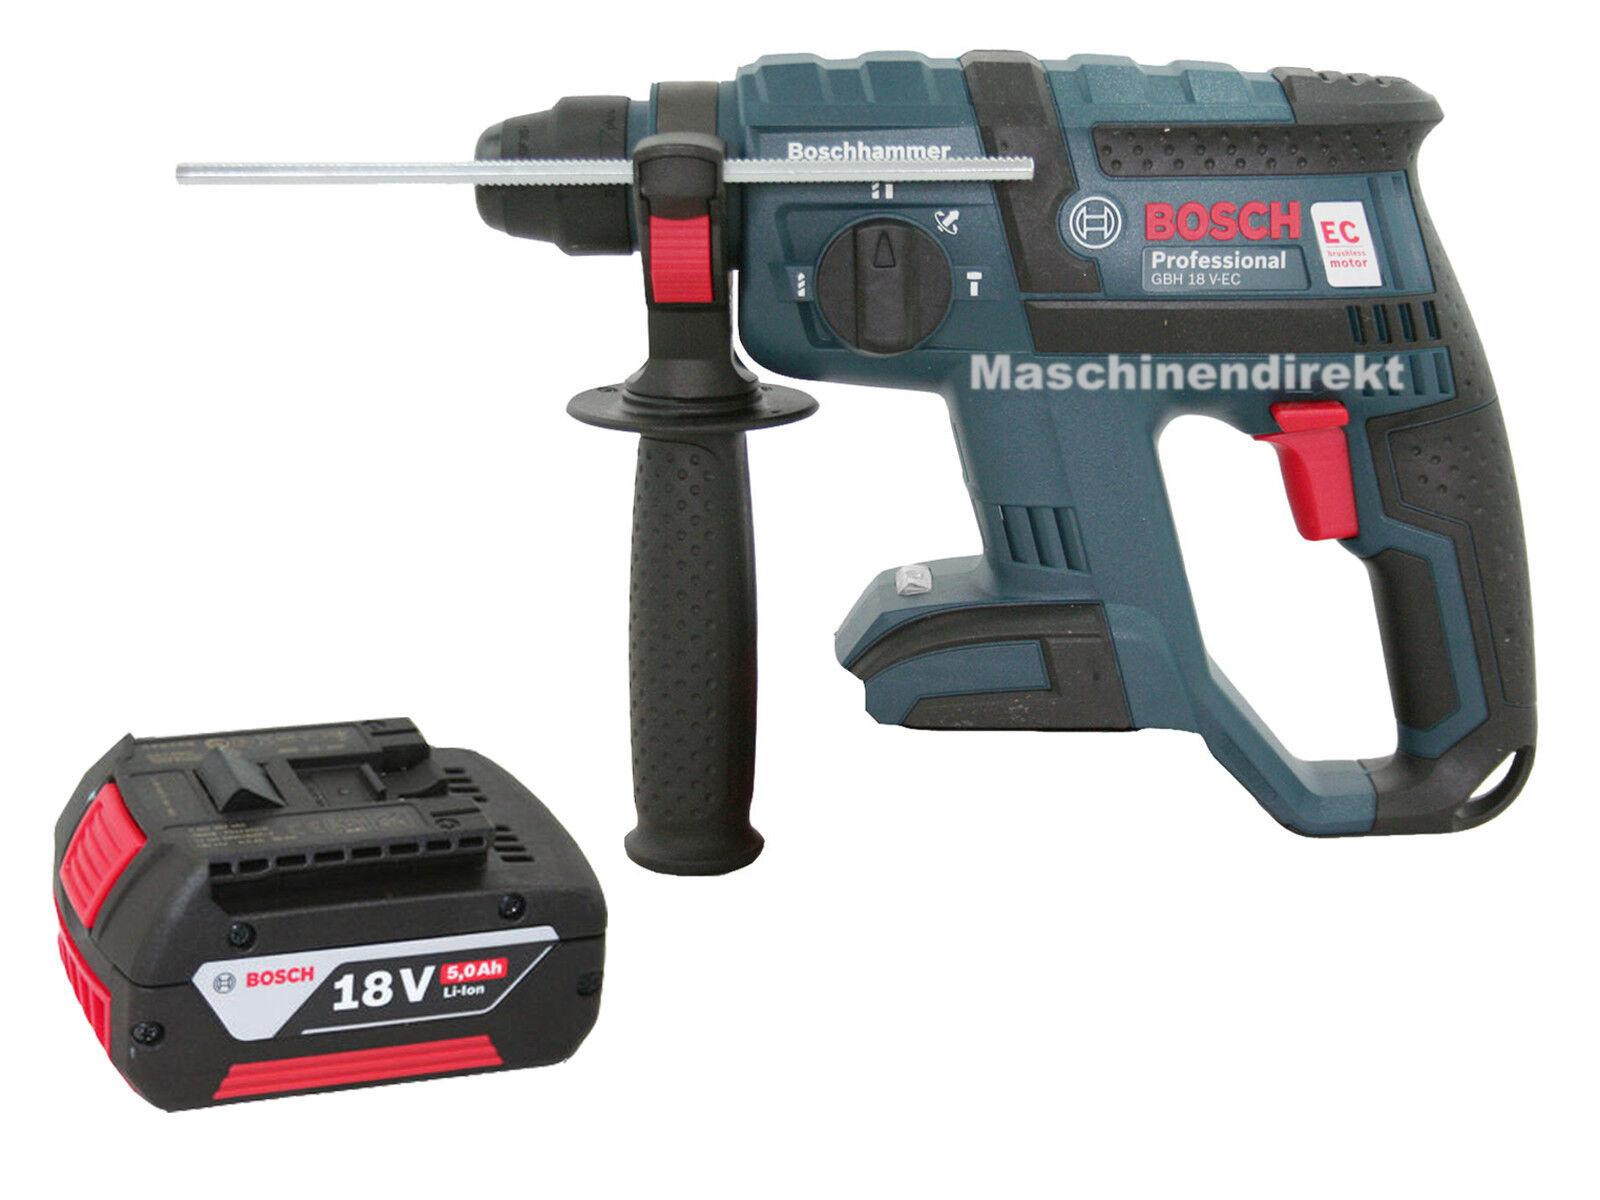 Bosch Akku Meißelhammer GBH 18 V-EC SDS plus Bohrhammer SOLO + 5,0 Ah Akku